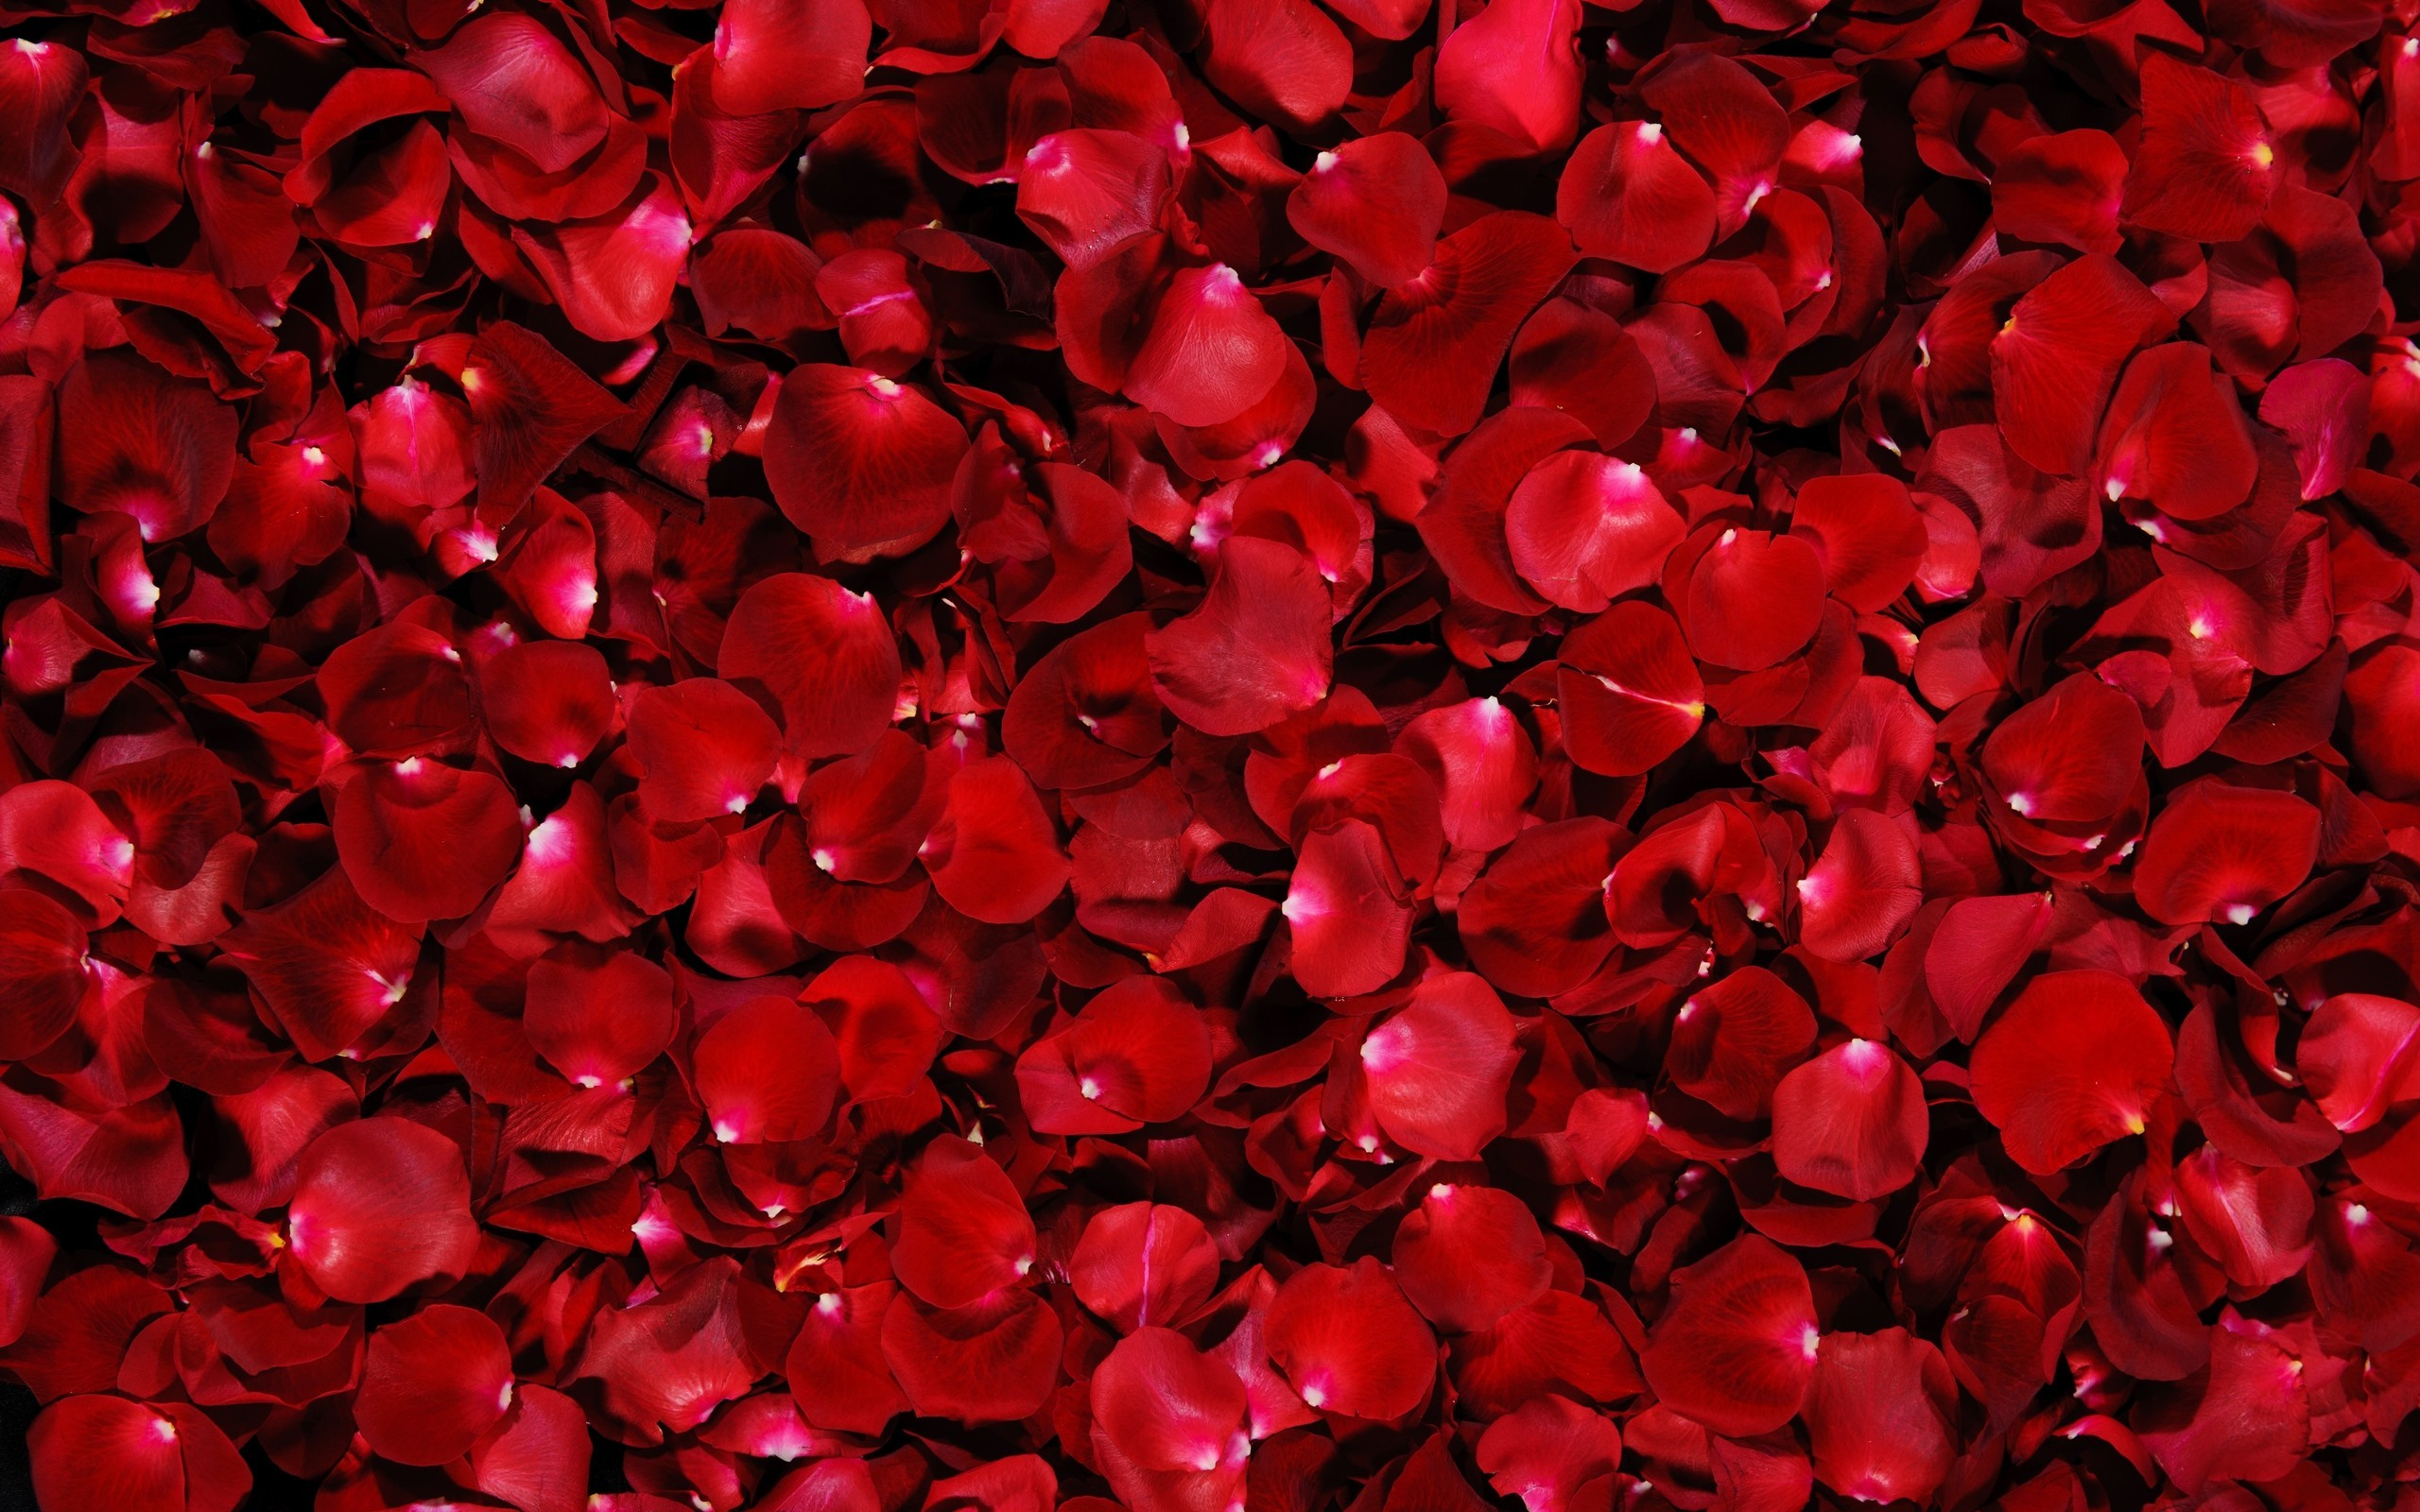 Image from https://www.flowerhdwallpaper.com/wp-content/uploads/2014/04/red- rose-pics-wallpapers-6.jpg. | 50 ѕнα∂єѕ σf яє∂ | Pinterest | Black  backgrounds …